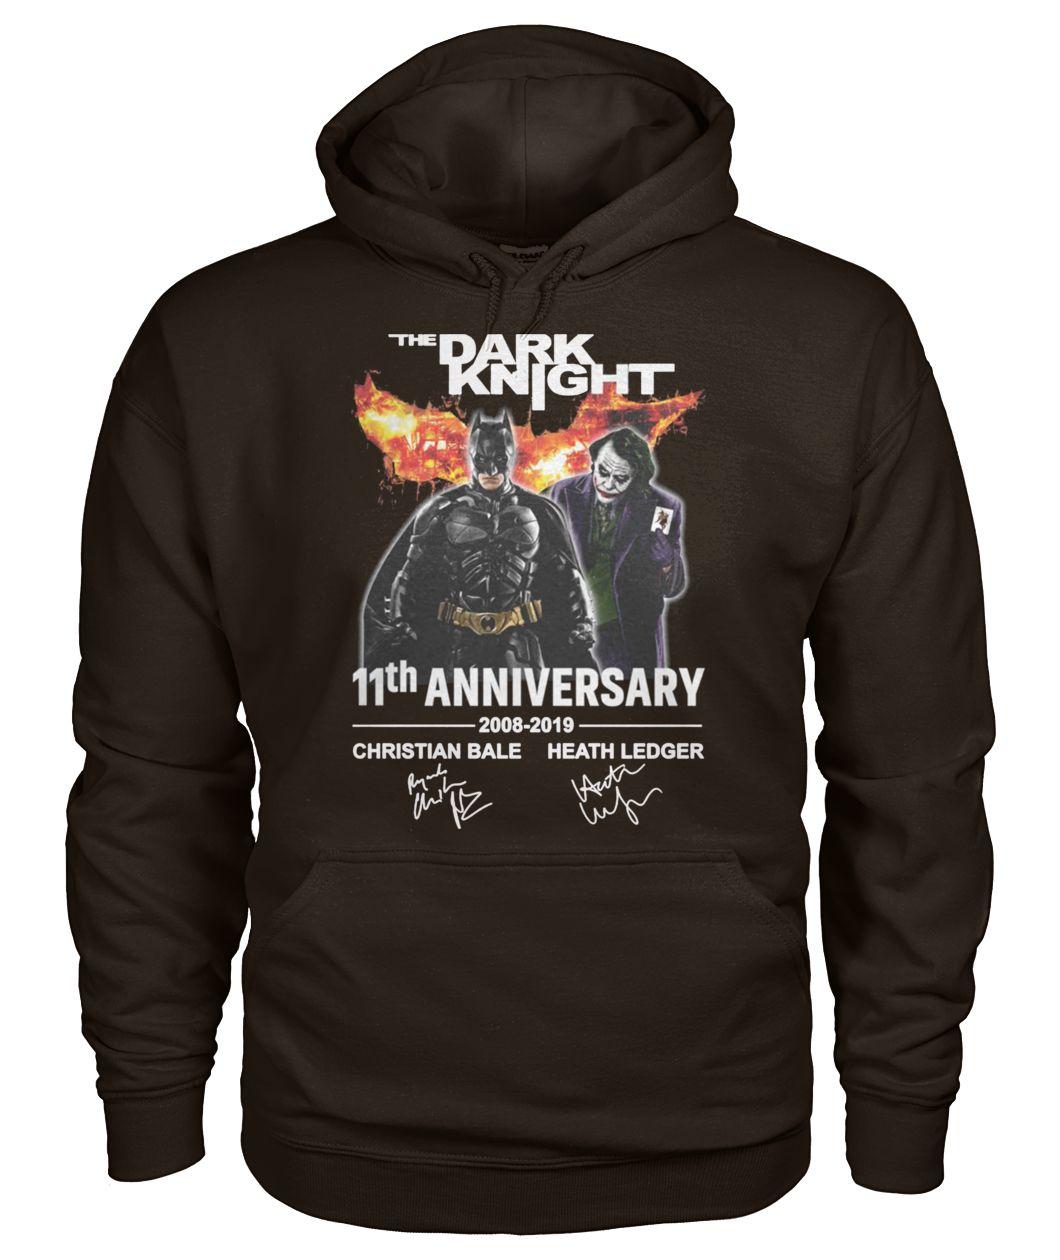 The dark knight 11th anniversary 2008-2019 signatures gildan hoodie